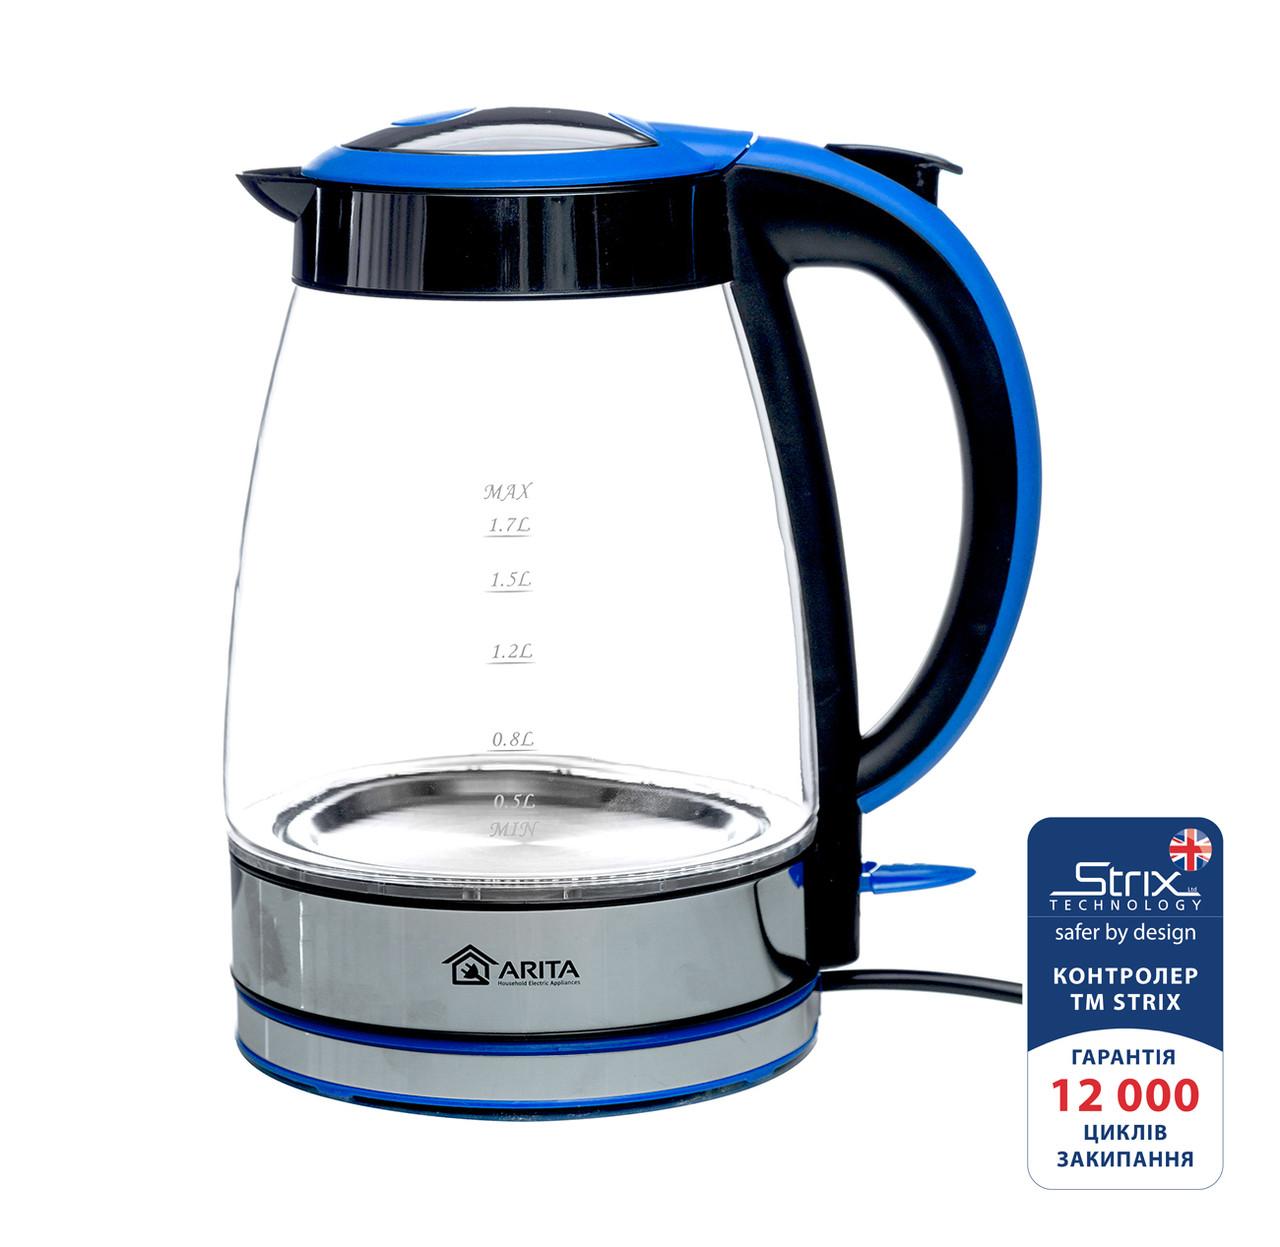 Чайник электрический Arita AKT-9205Bl